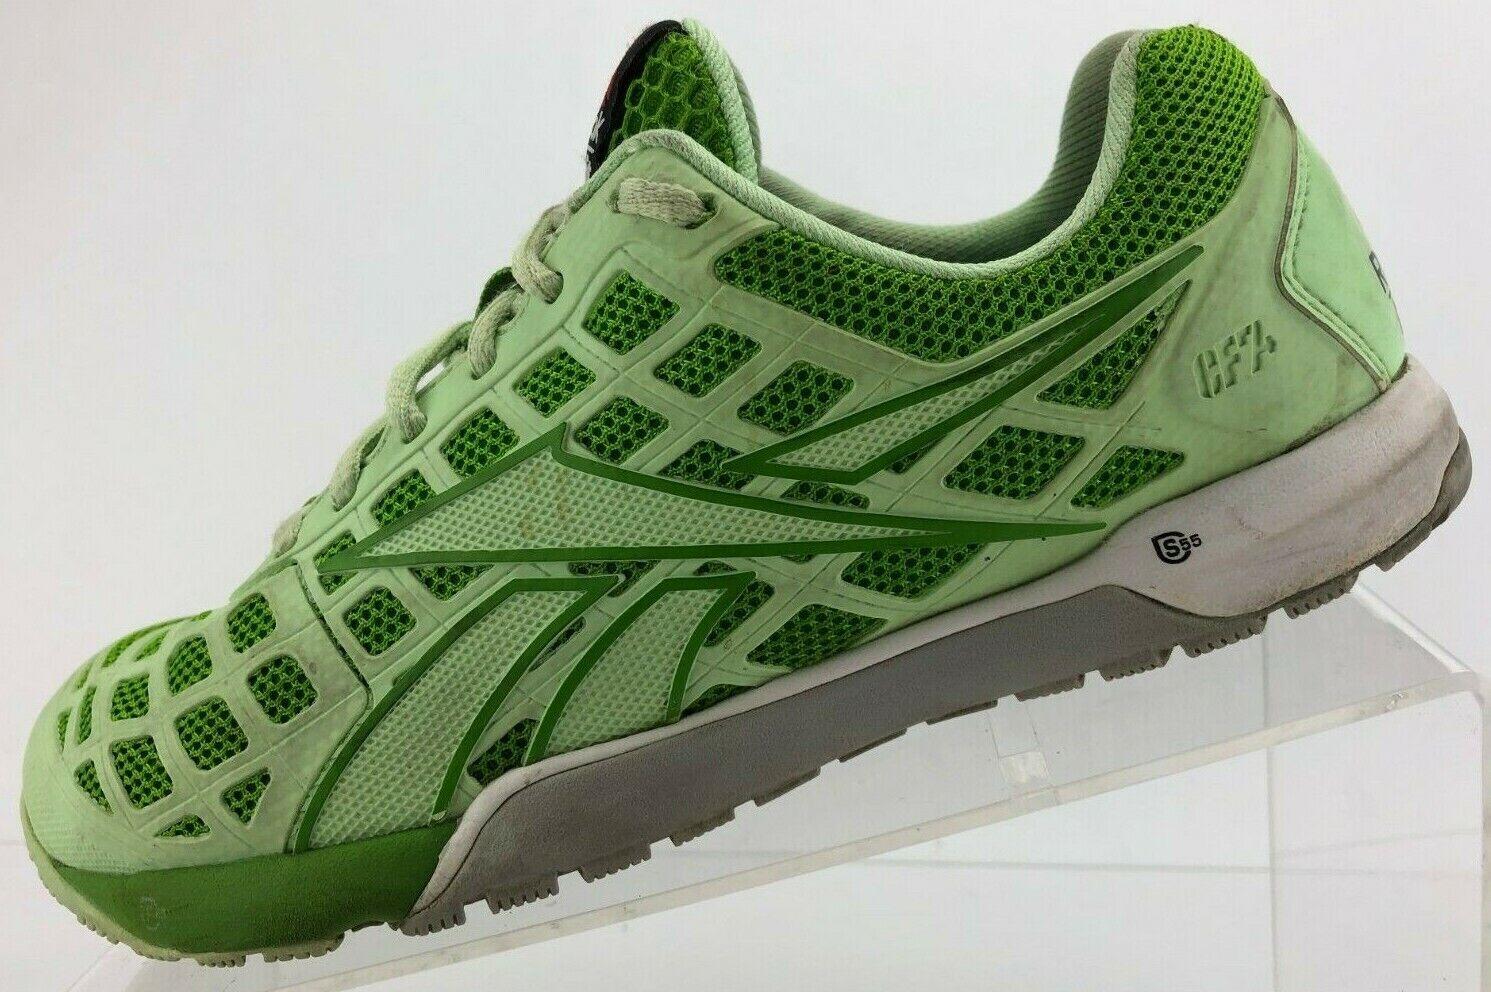 Reebok CrossFit Nano 3.0 Cross Training Chaussures Vert Athlétique Baskets Femme 7.5